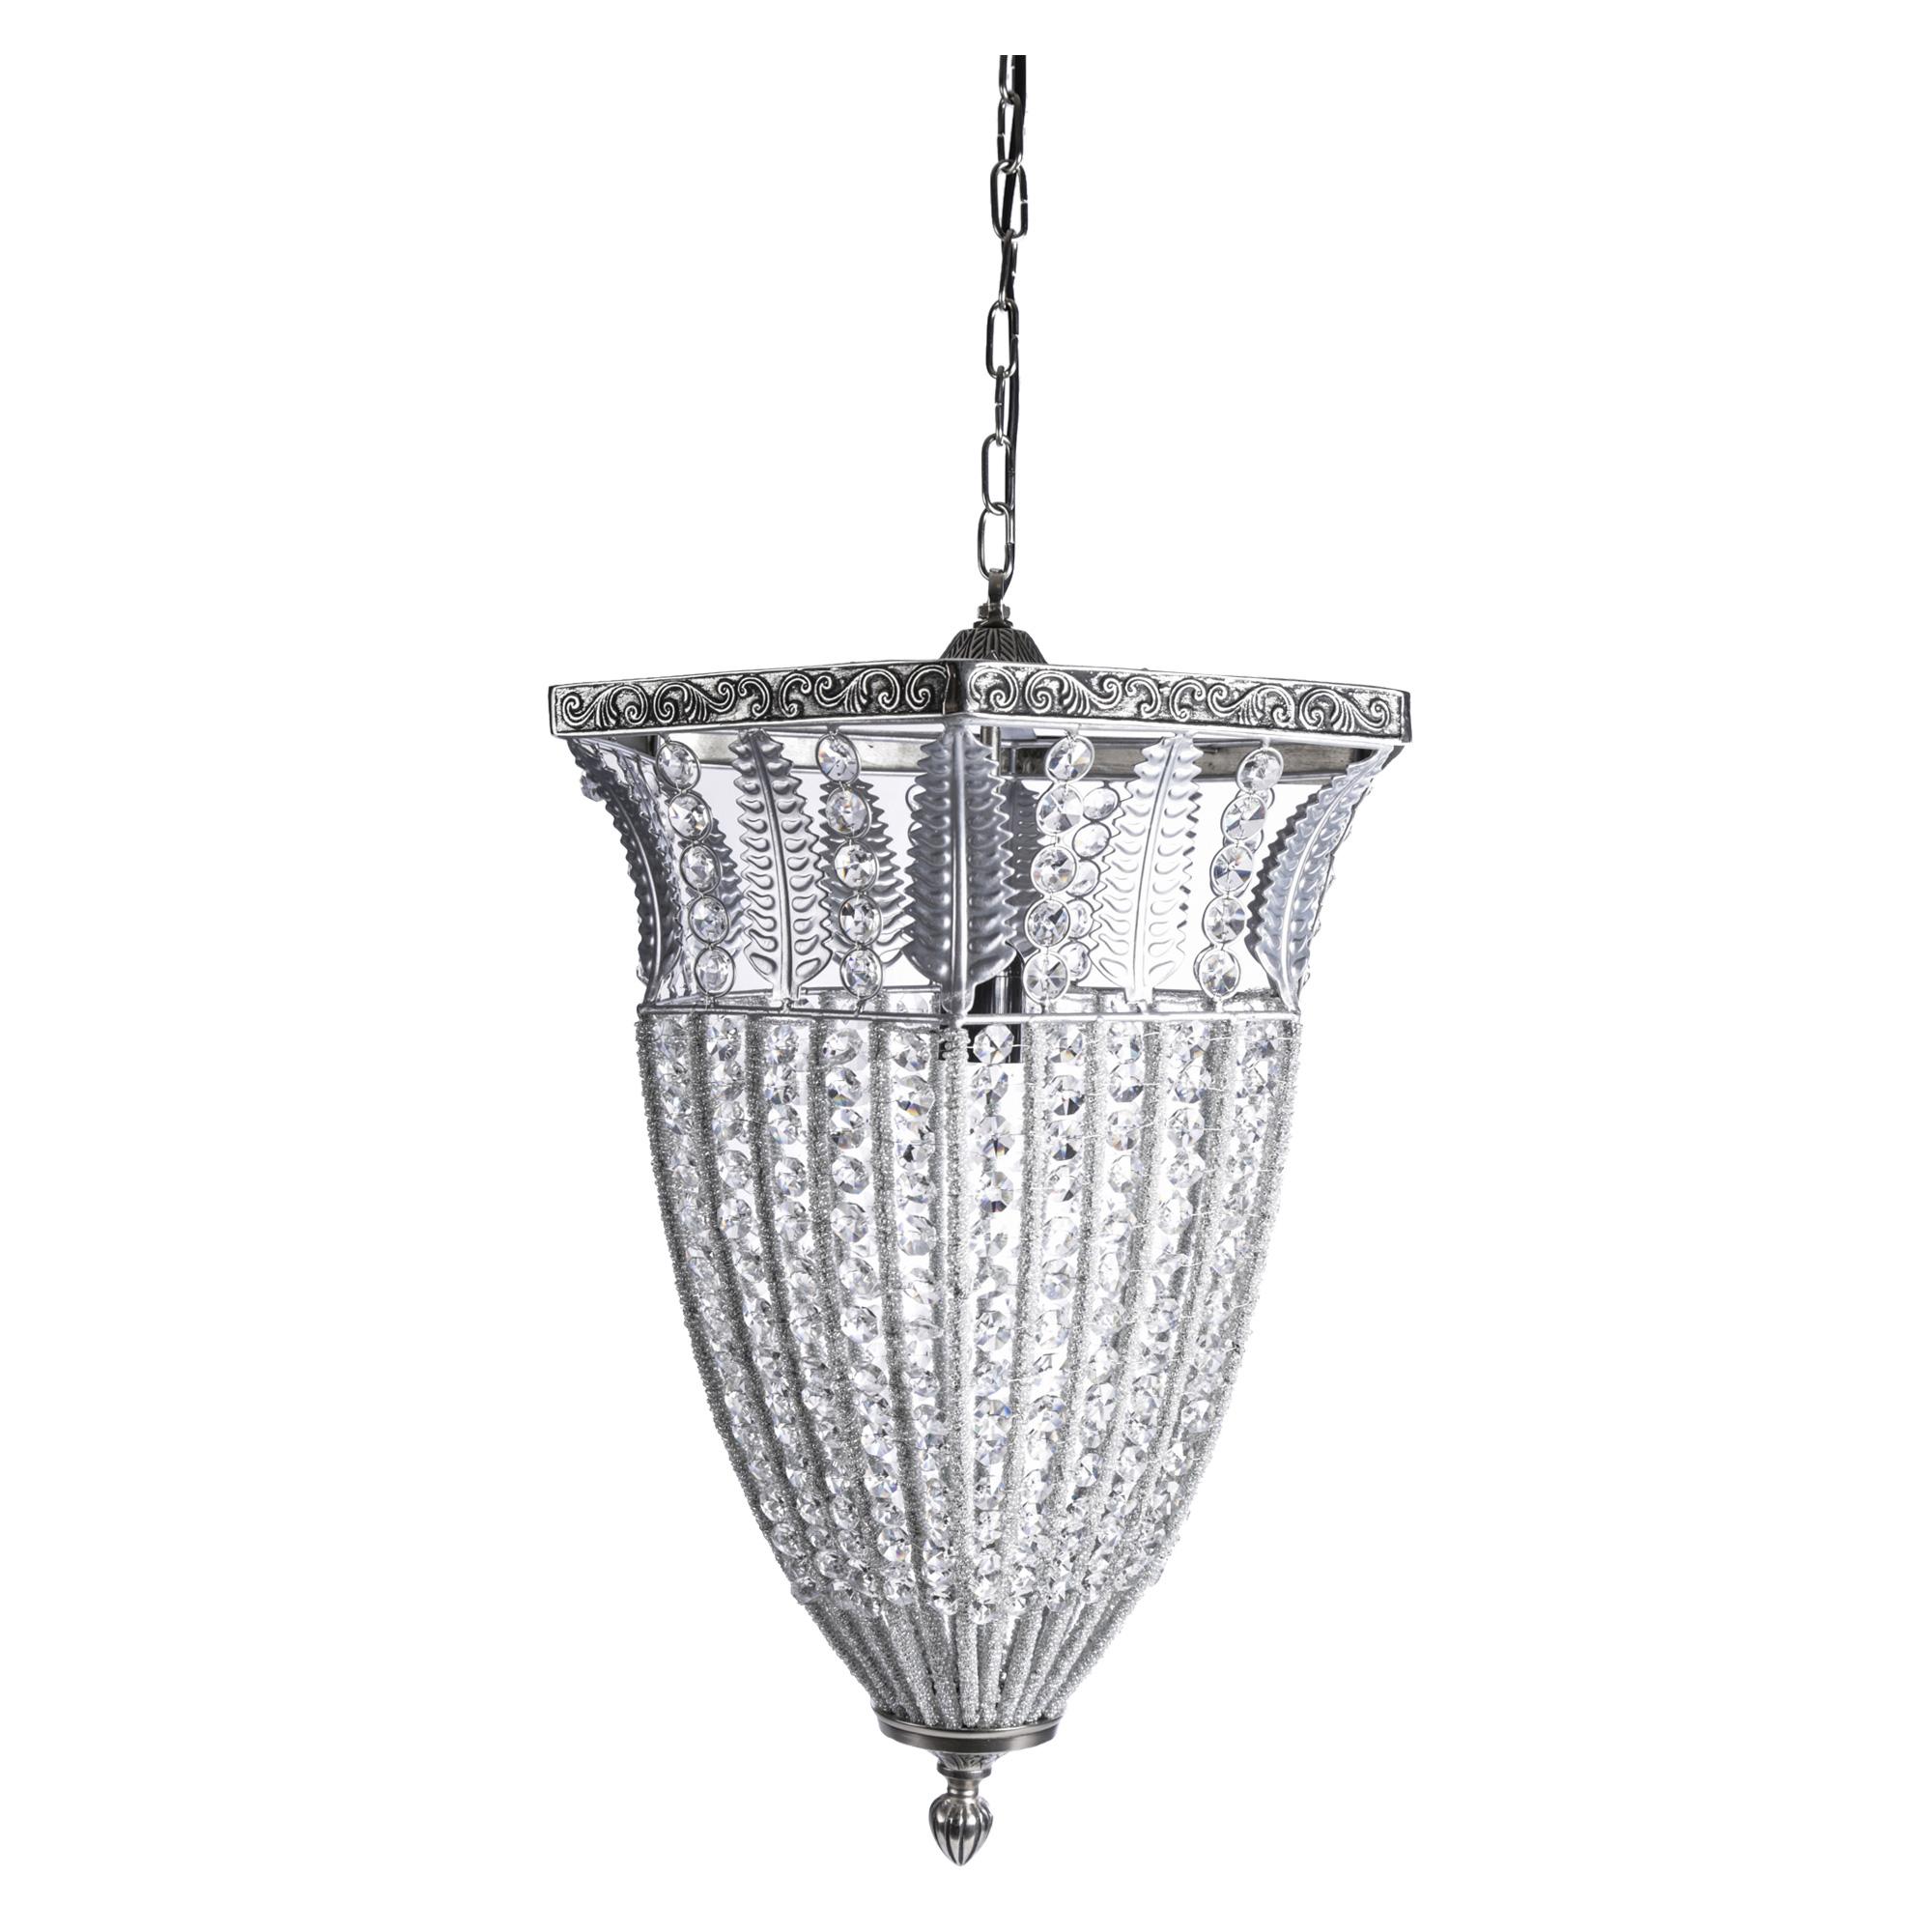 PTMD thrilling glass lamp diamonds